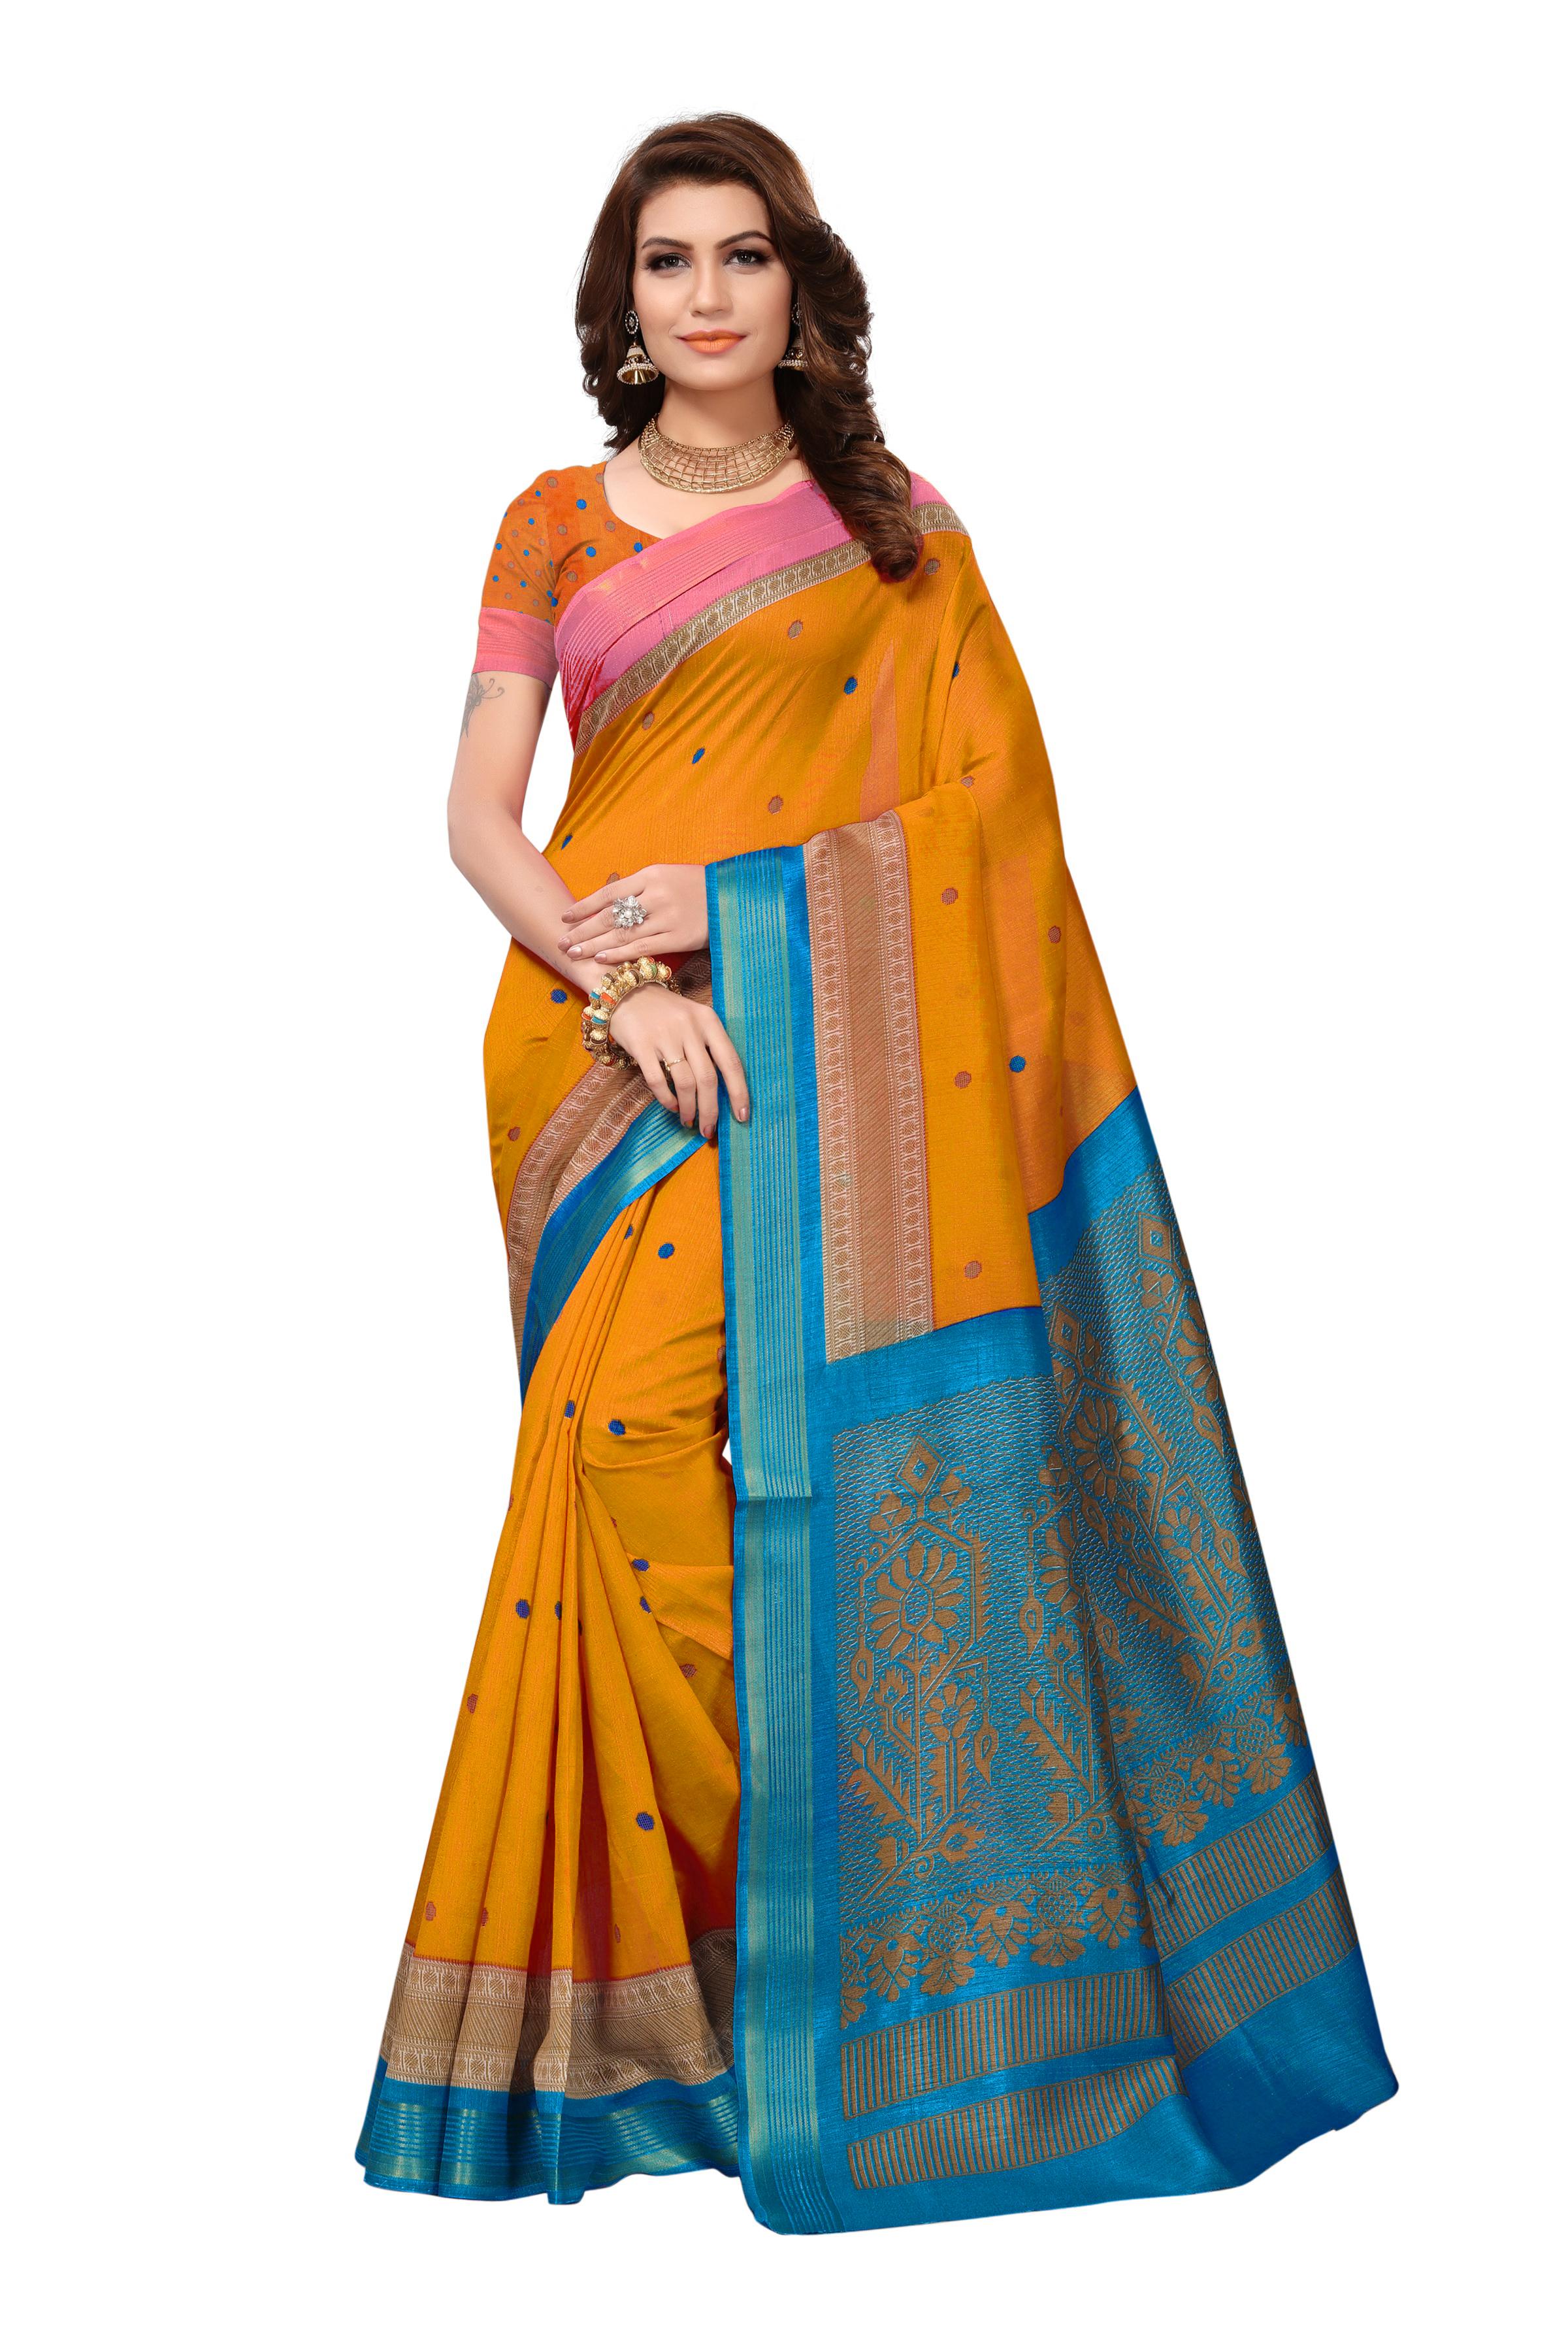 Vasundra silk saree